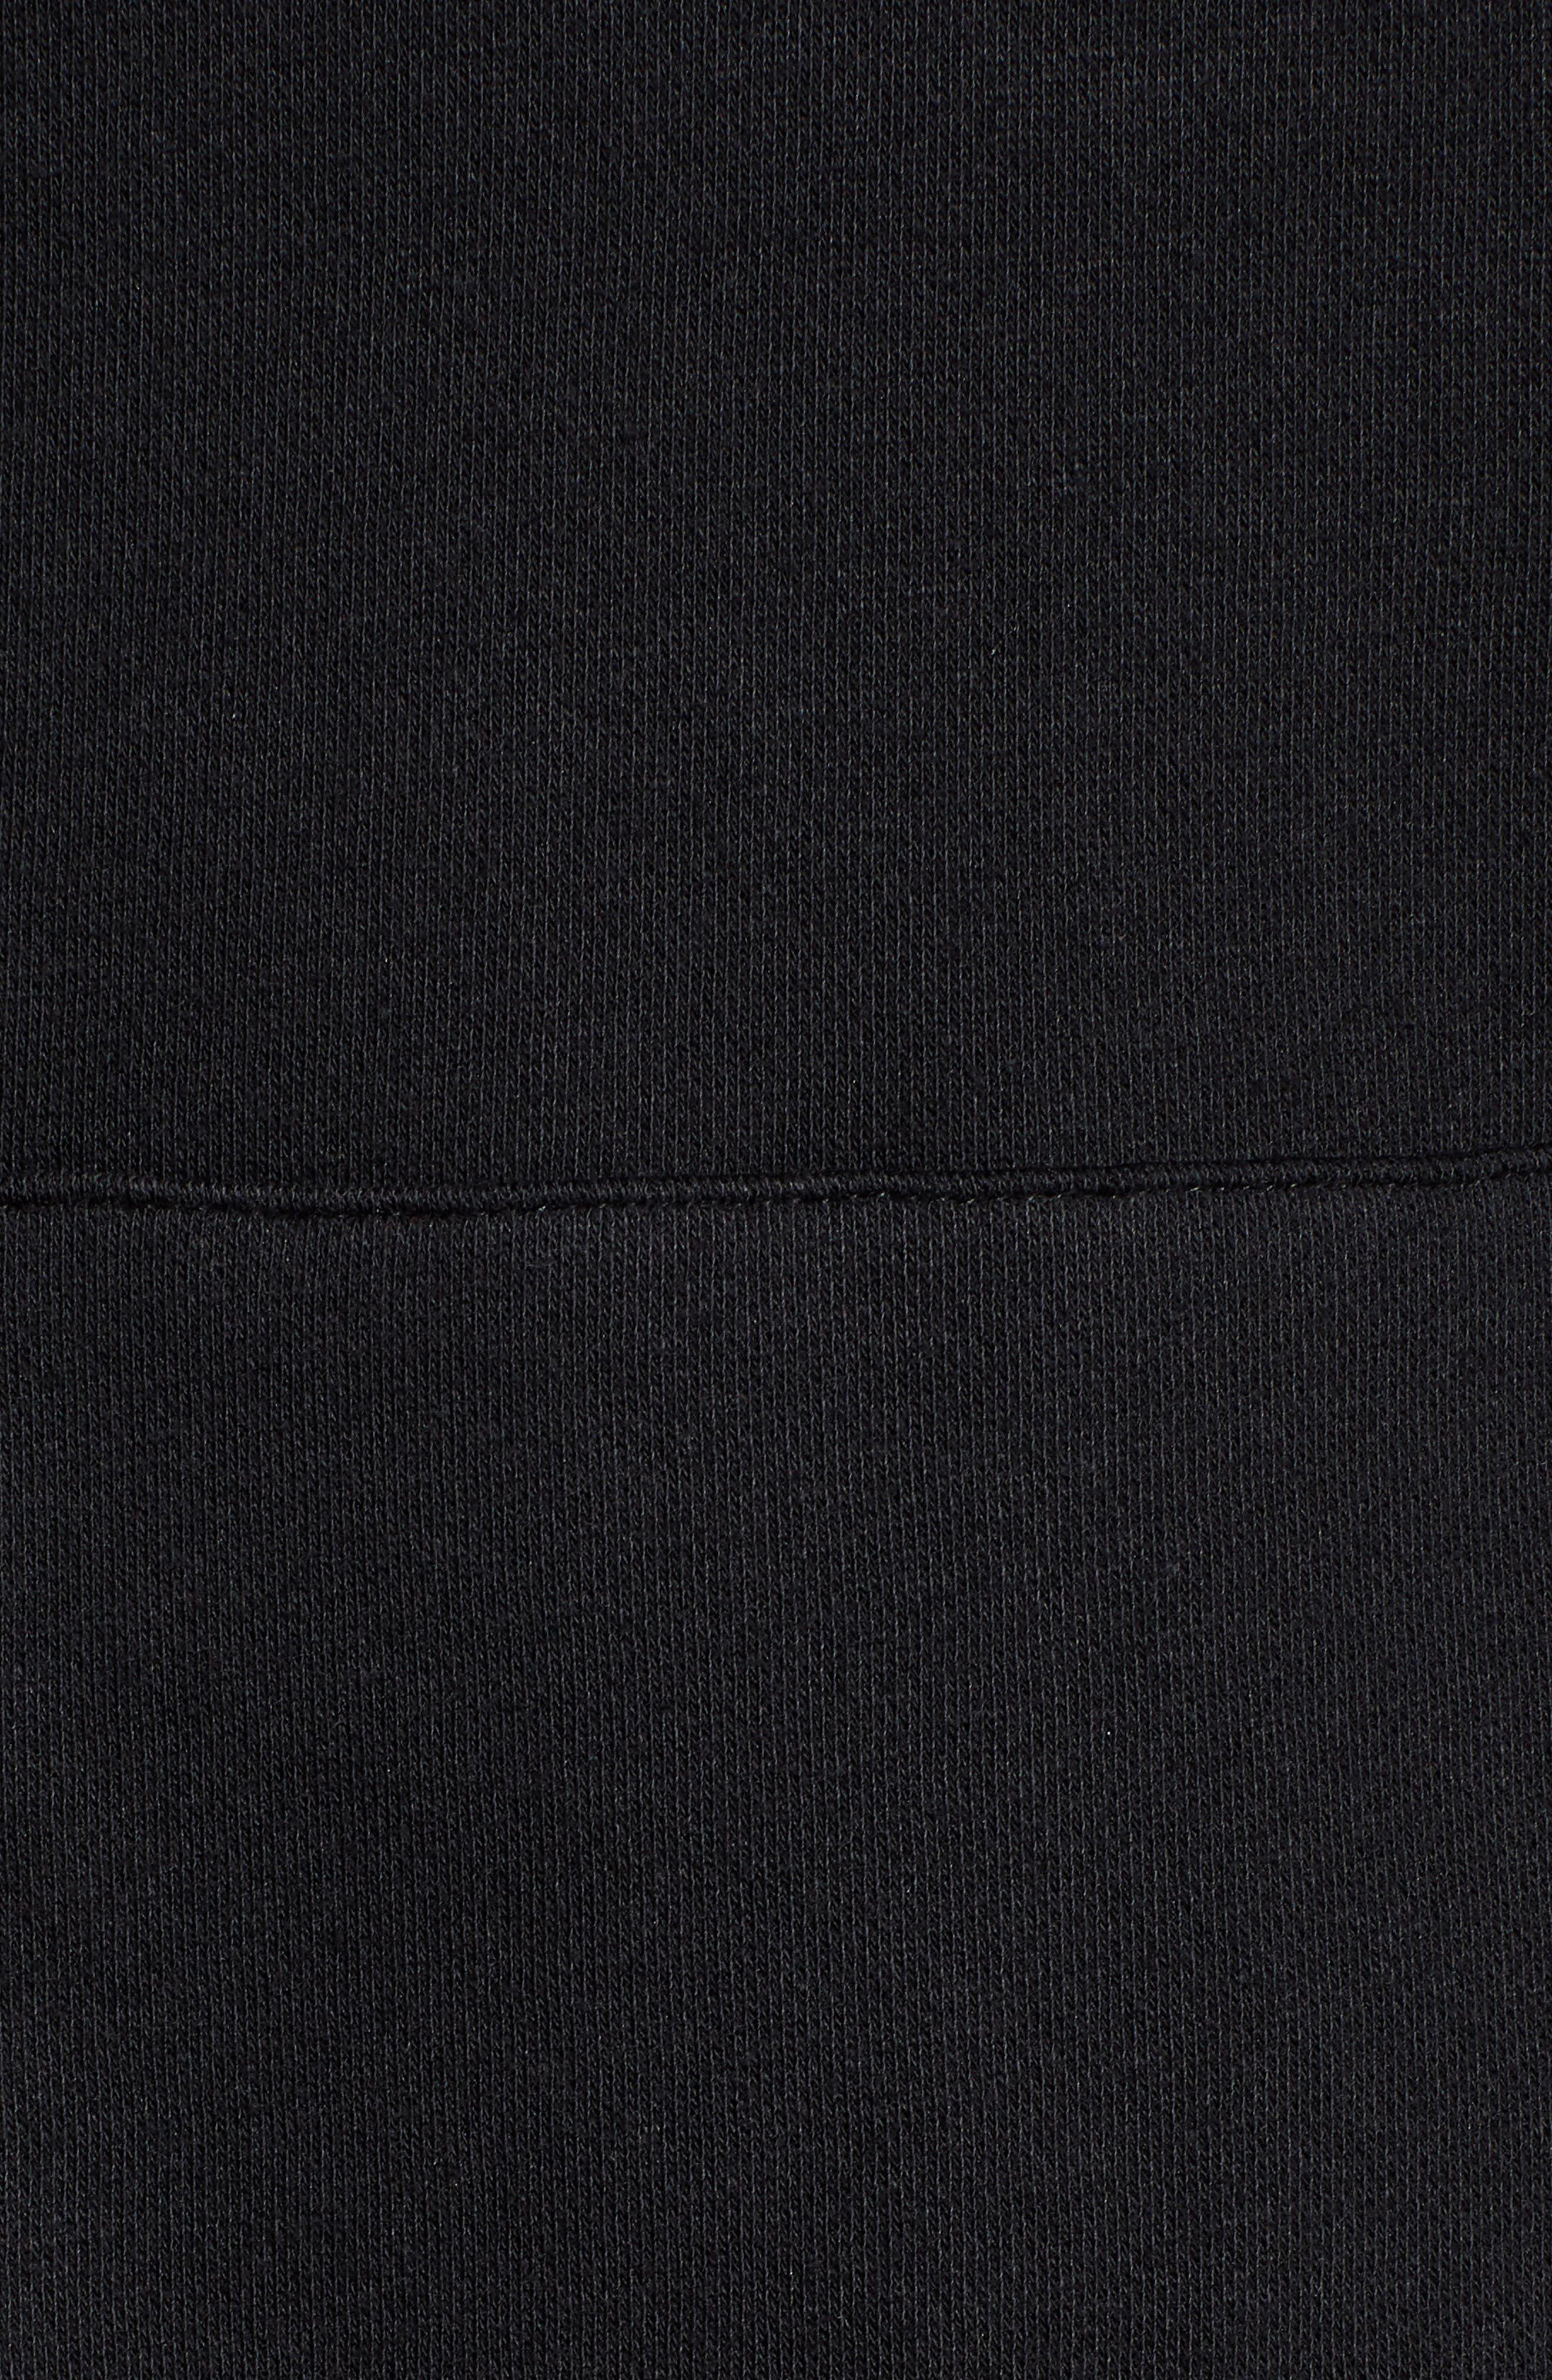 Oath SV III Hooded Sweatshirt,                             Alternate thumbnail 5, color,                             001